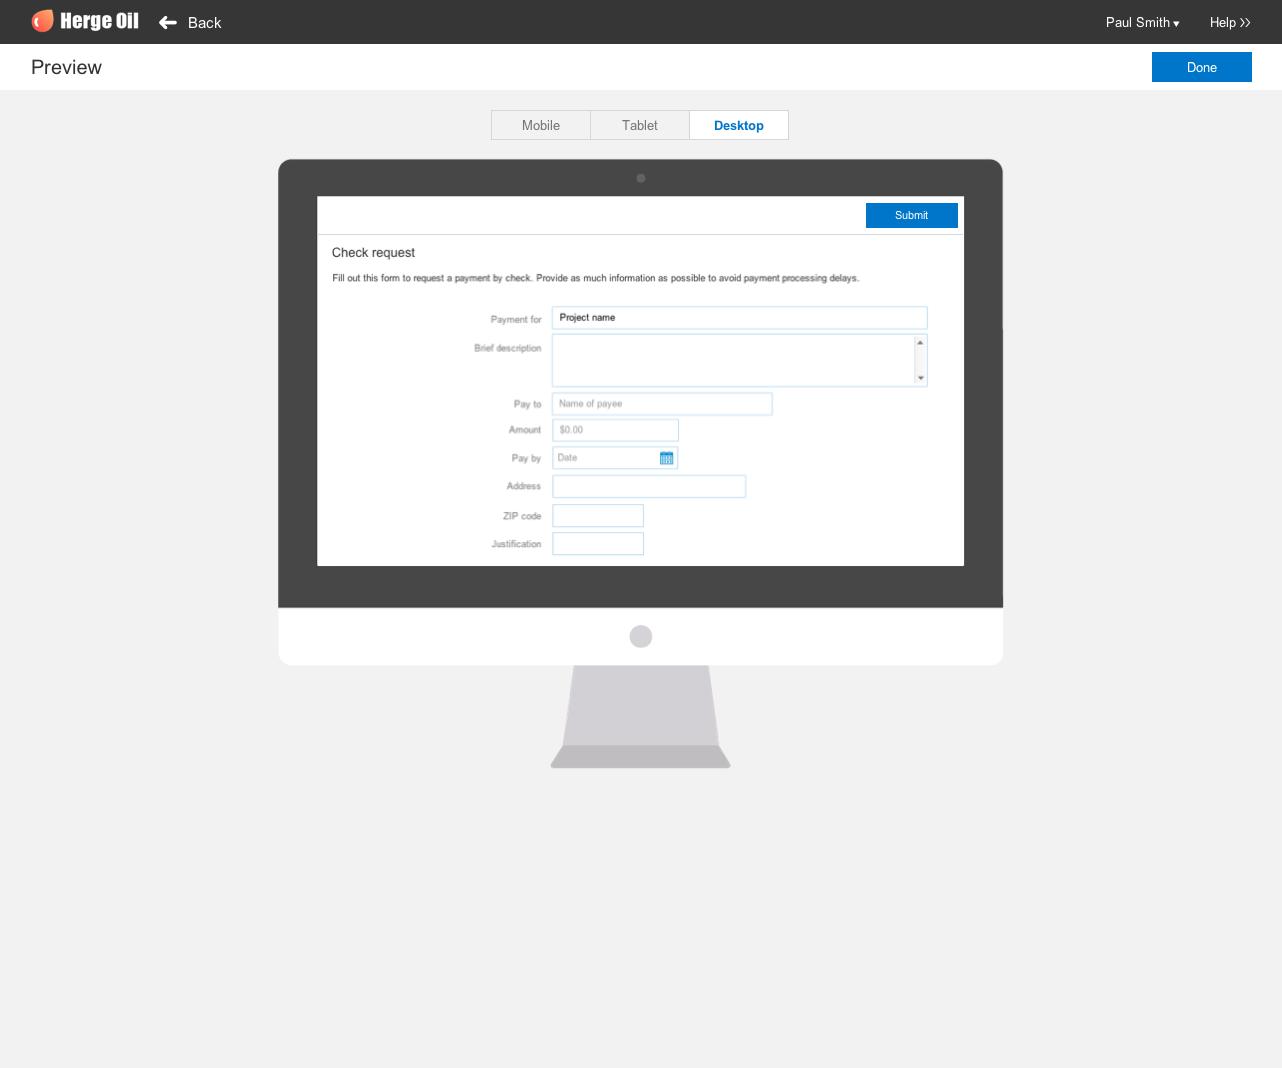 ASUG Briefing: SAP Ariba Opens Up API, Offers Self-Service